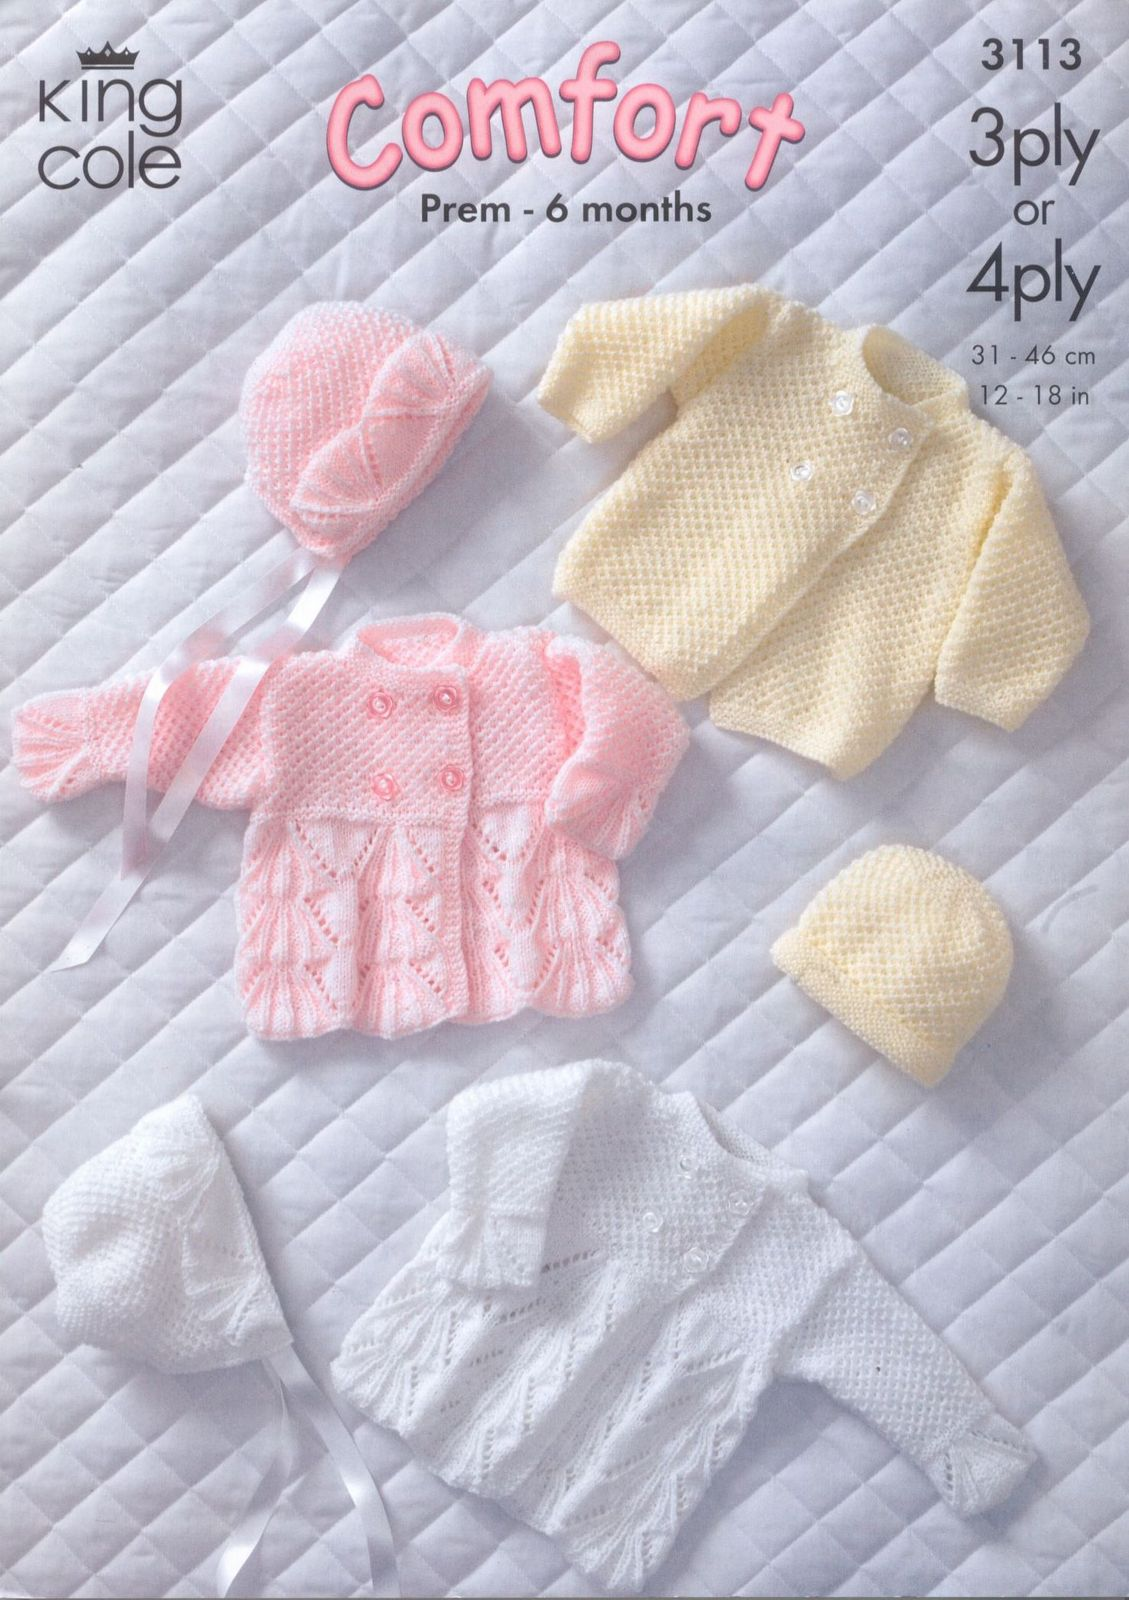 http://vjazhi.ru/images/stories/detyam/malysham/set1/baby_set.jpg